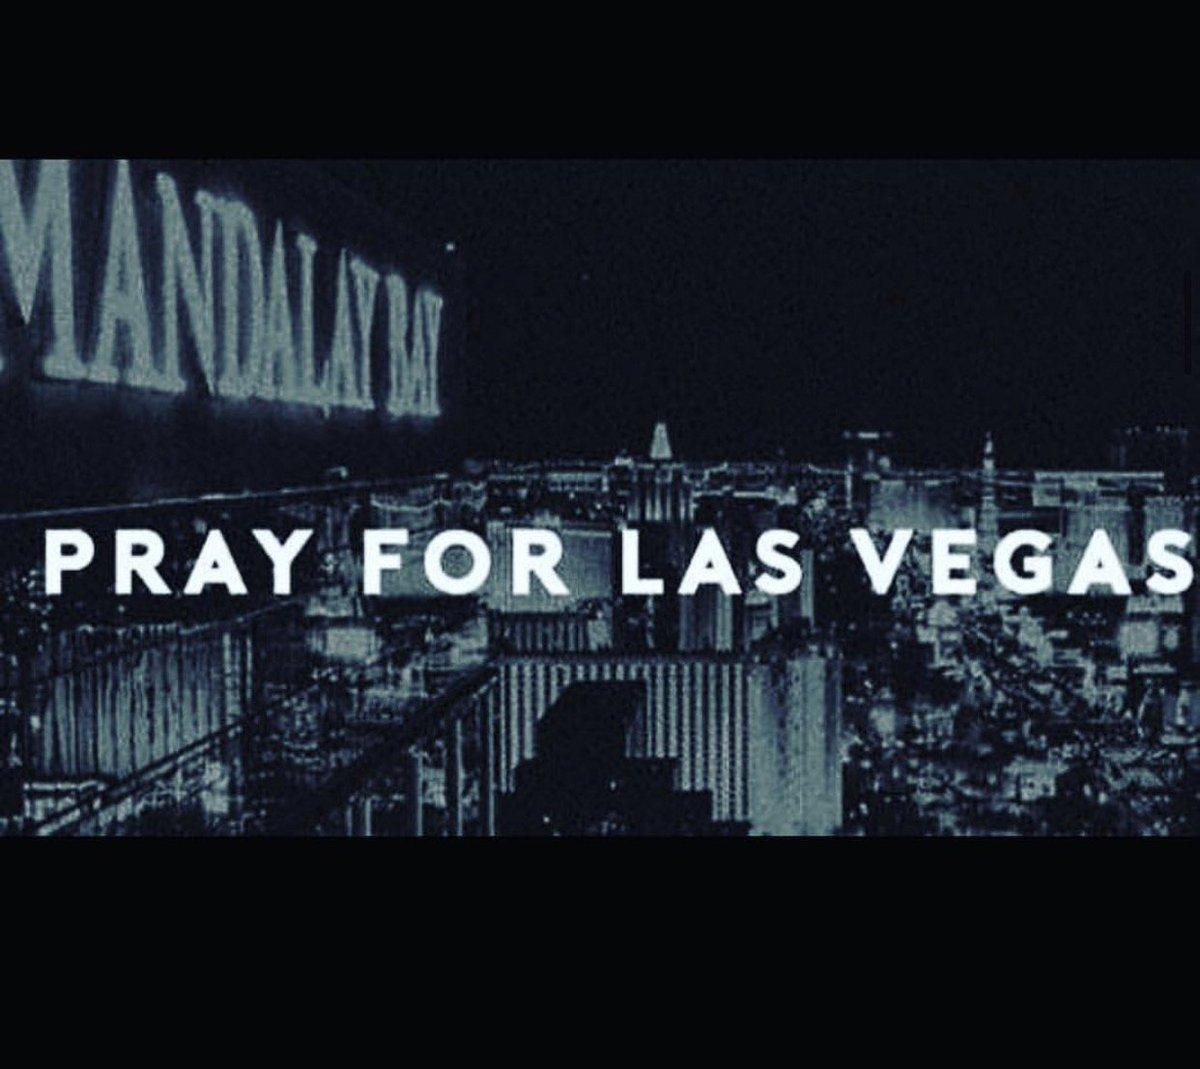 #prayforlasvegas #vegas https://t.co/5fv33unMWm